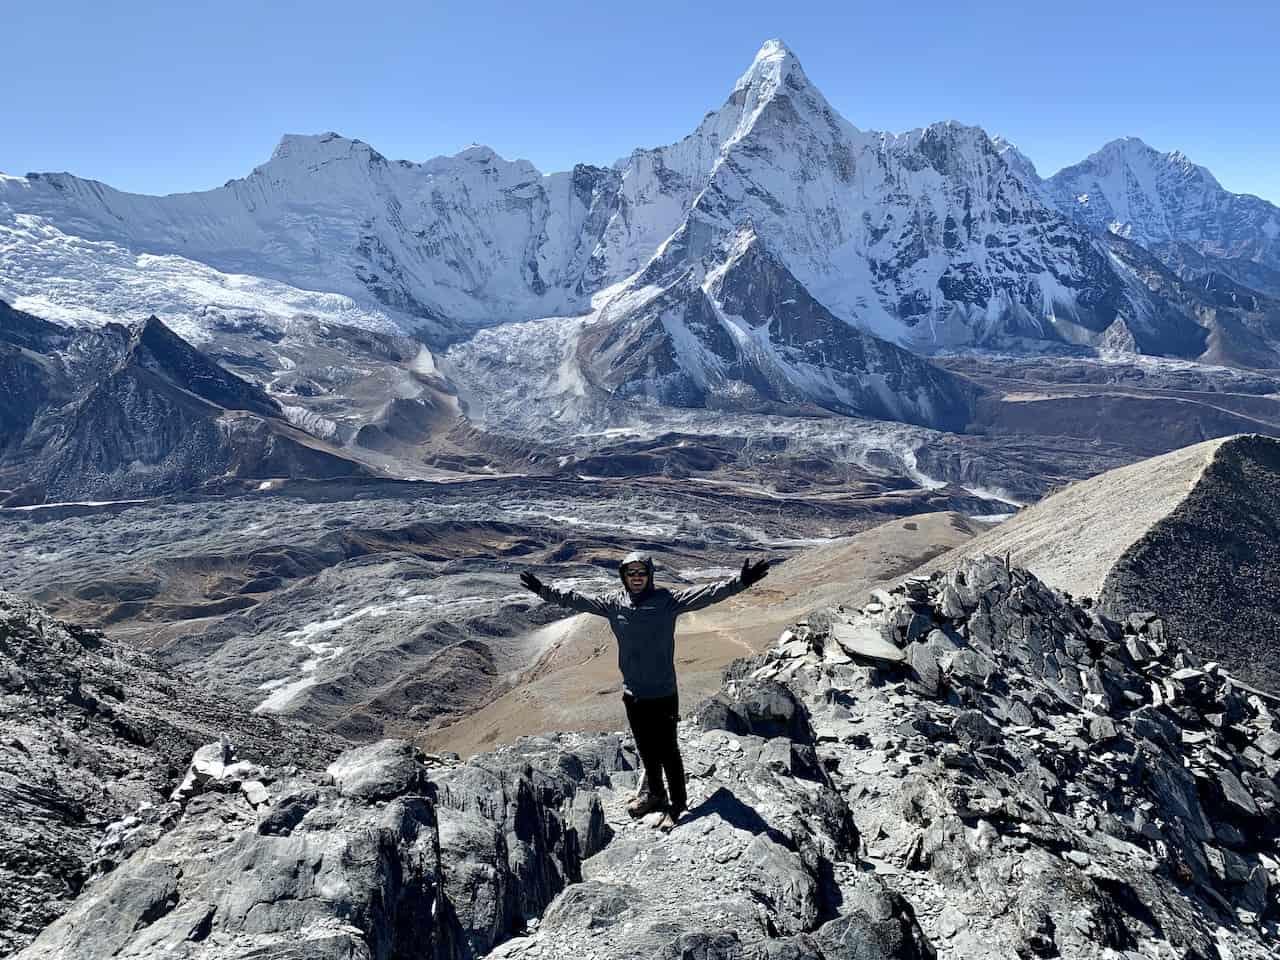 Rainjacket Windbreaker Everest